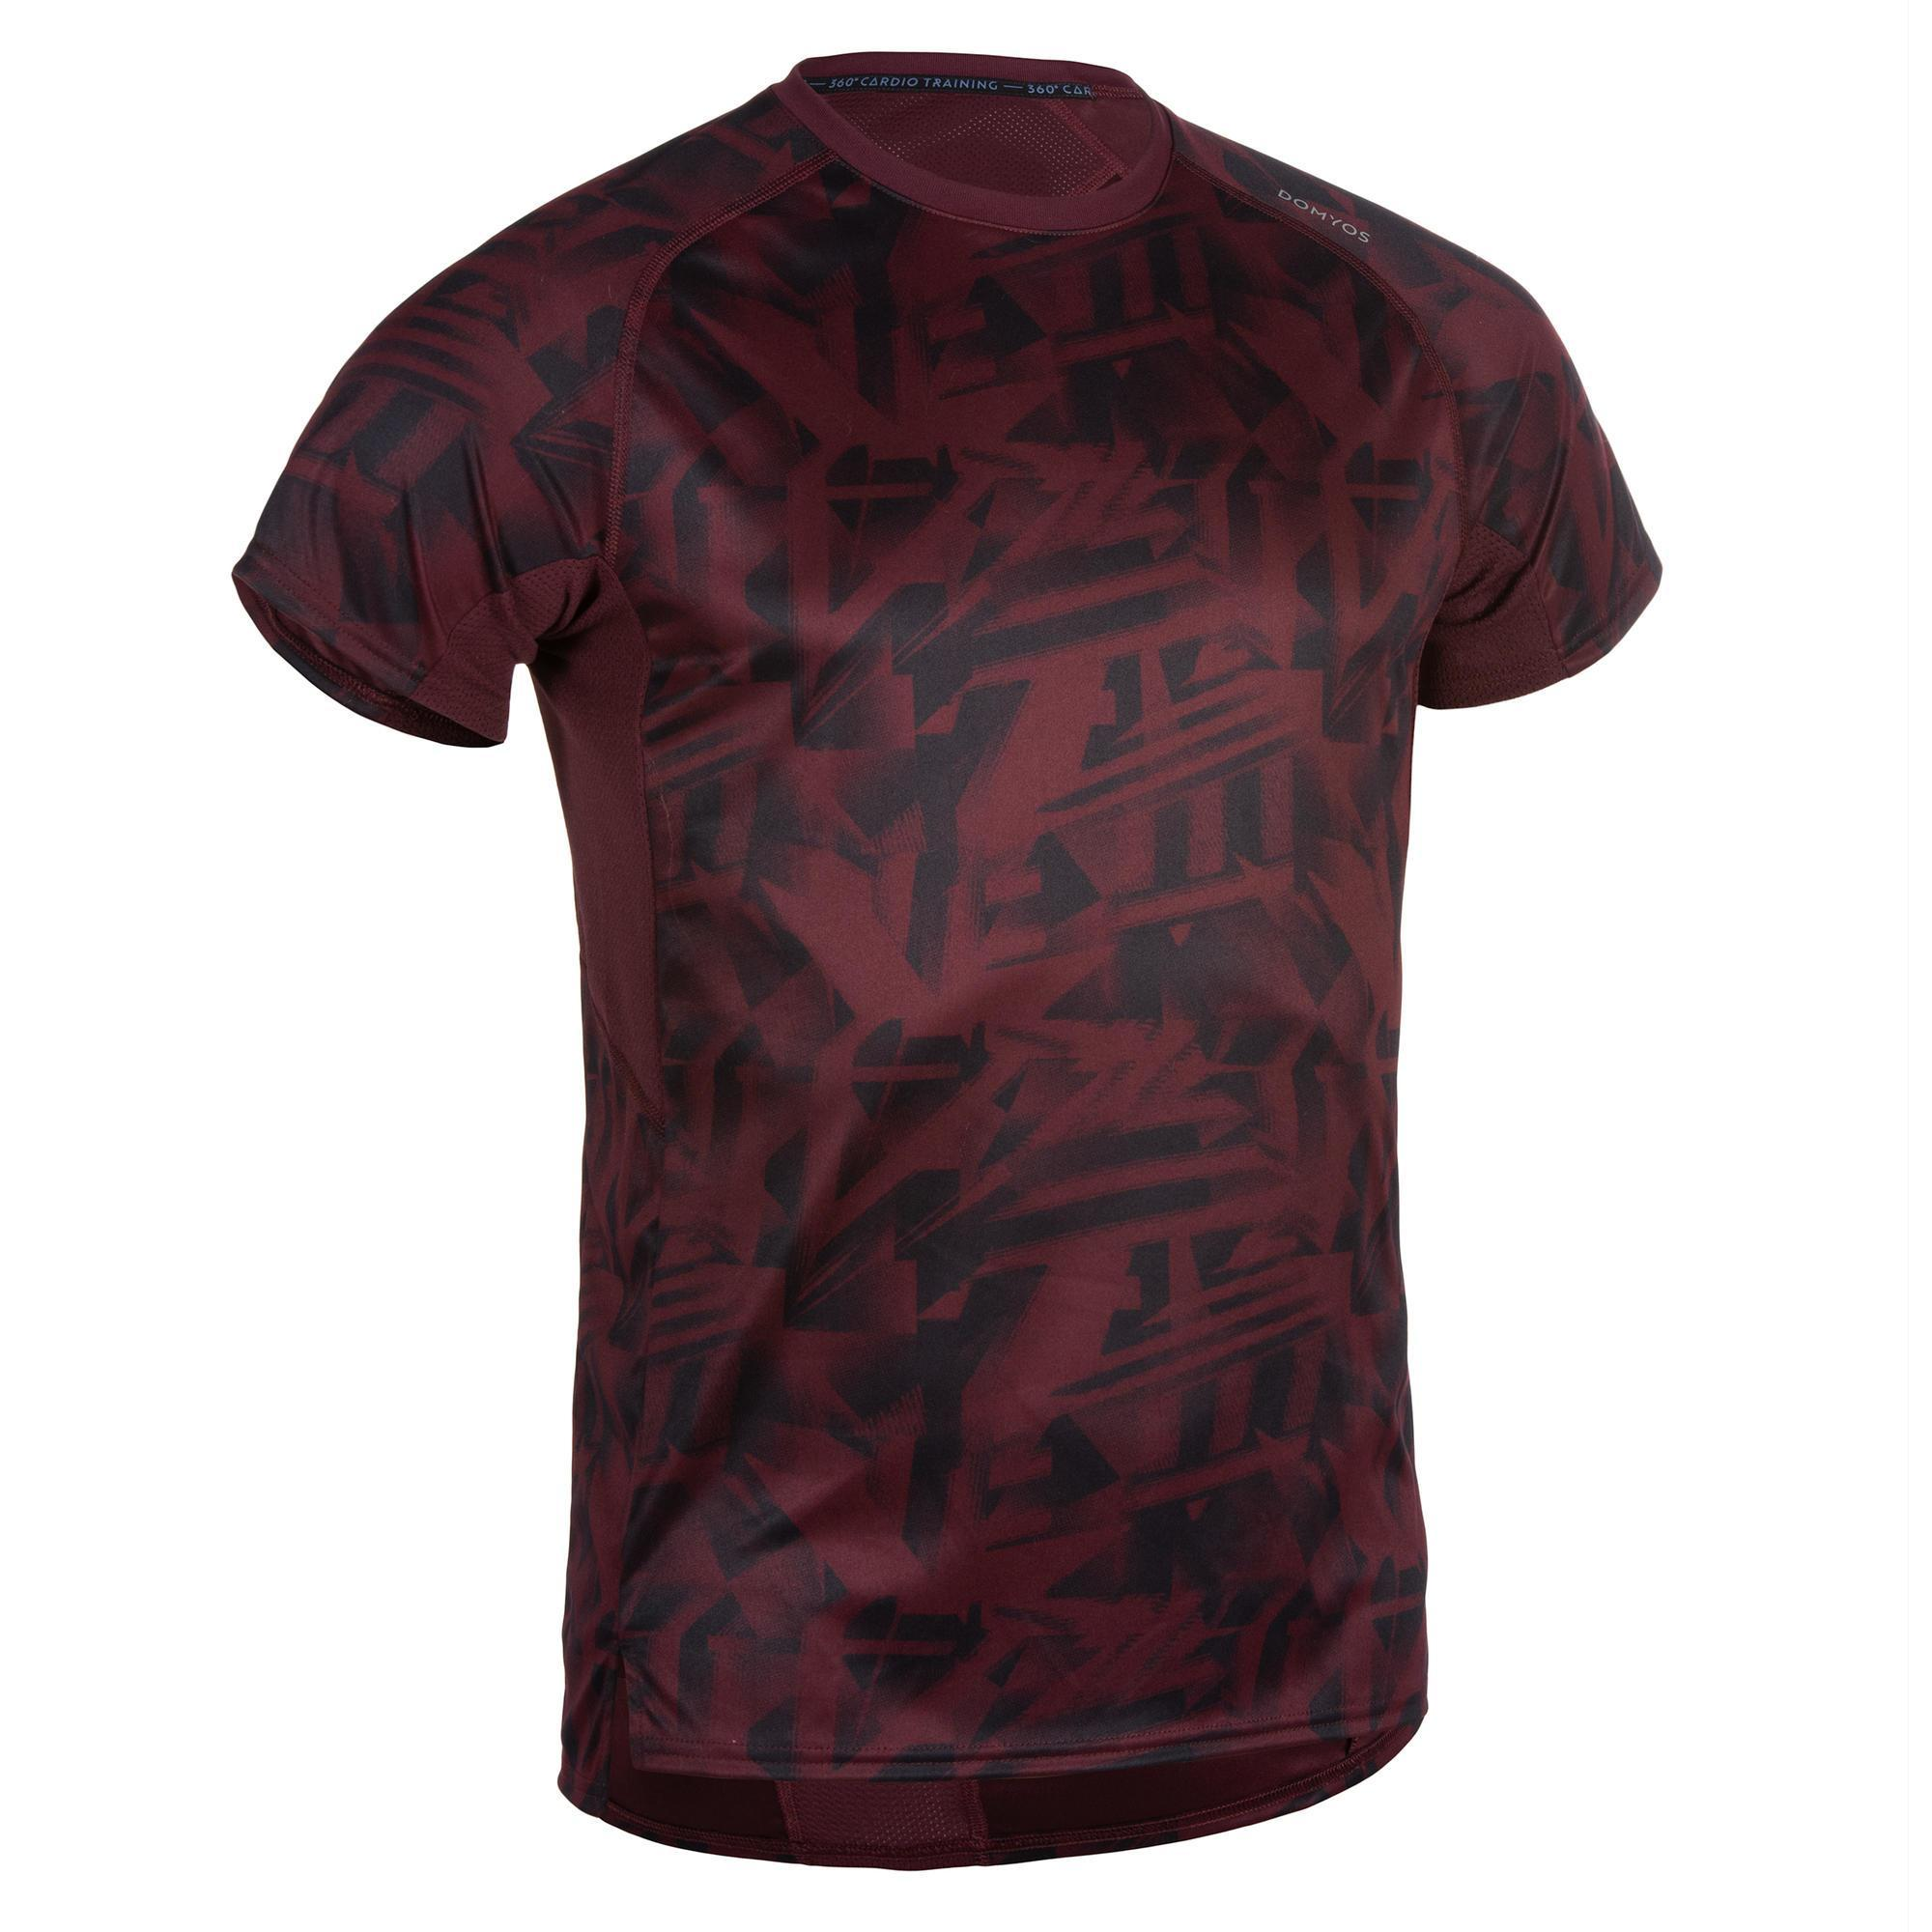 T-Shirt FTS 120 Fitness Cardio Herren bordeaux meliert | Sportbekleidung > Sportshirts > Poloshirts | Rot | Domyos